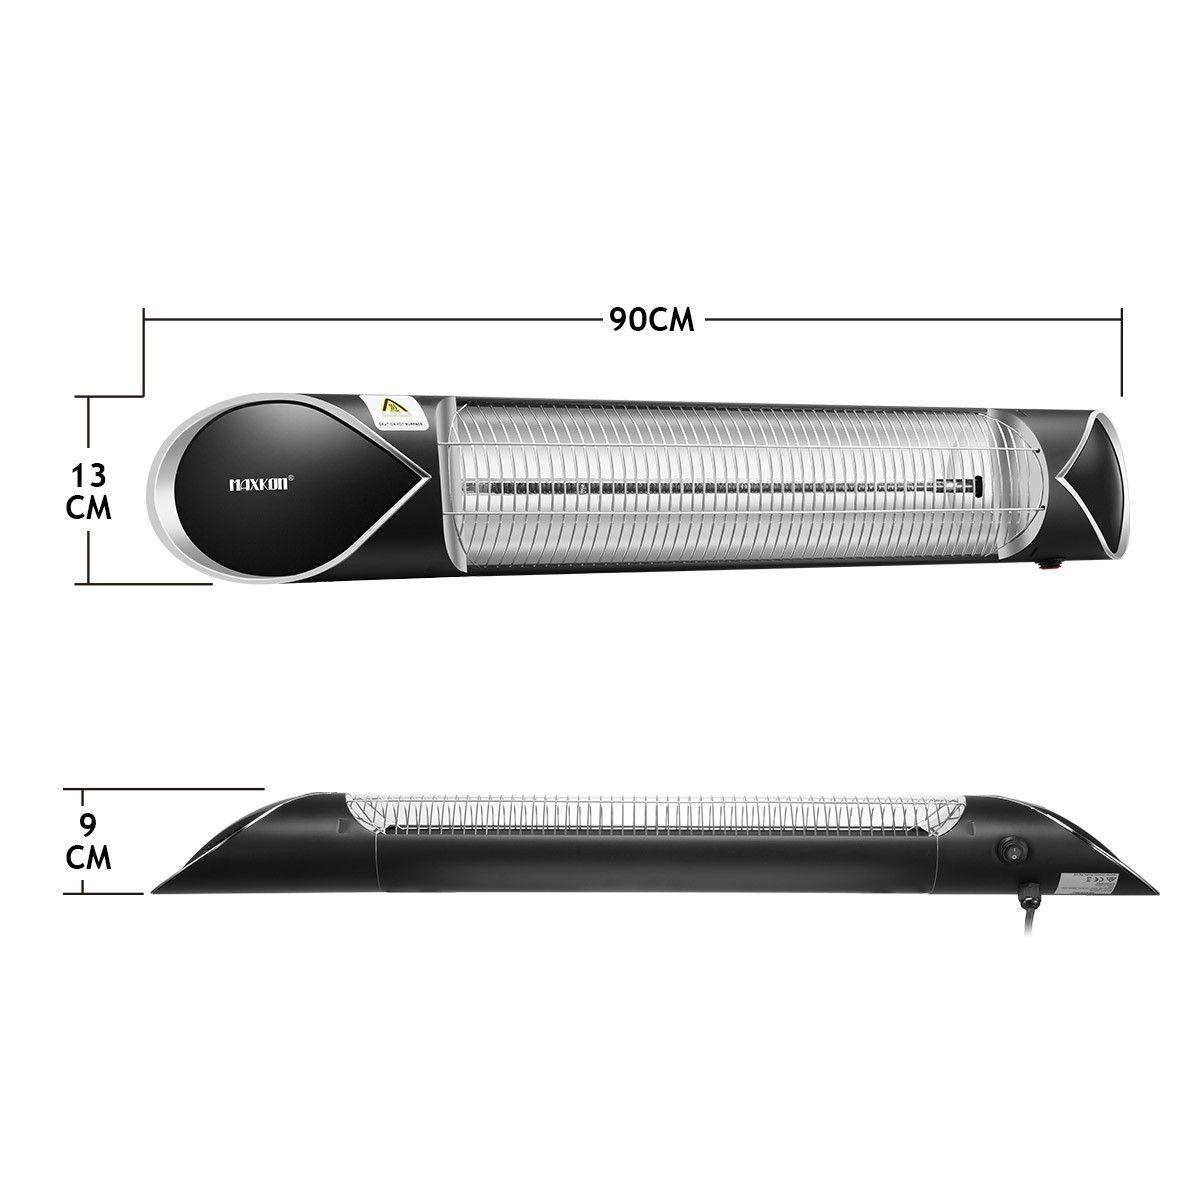 Maxkon 2500w Carbon Fibre Infrared Heater Instant Heat